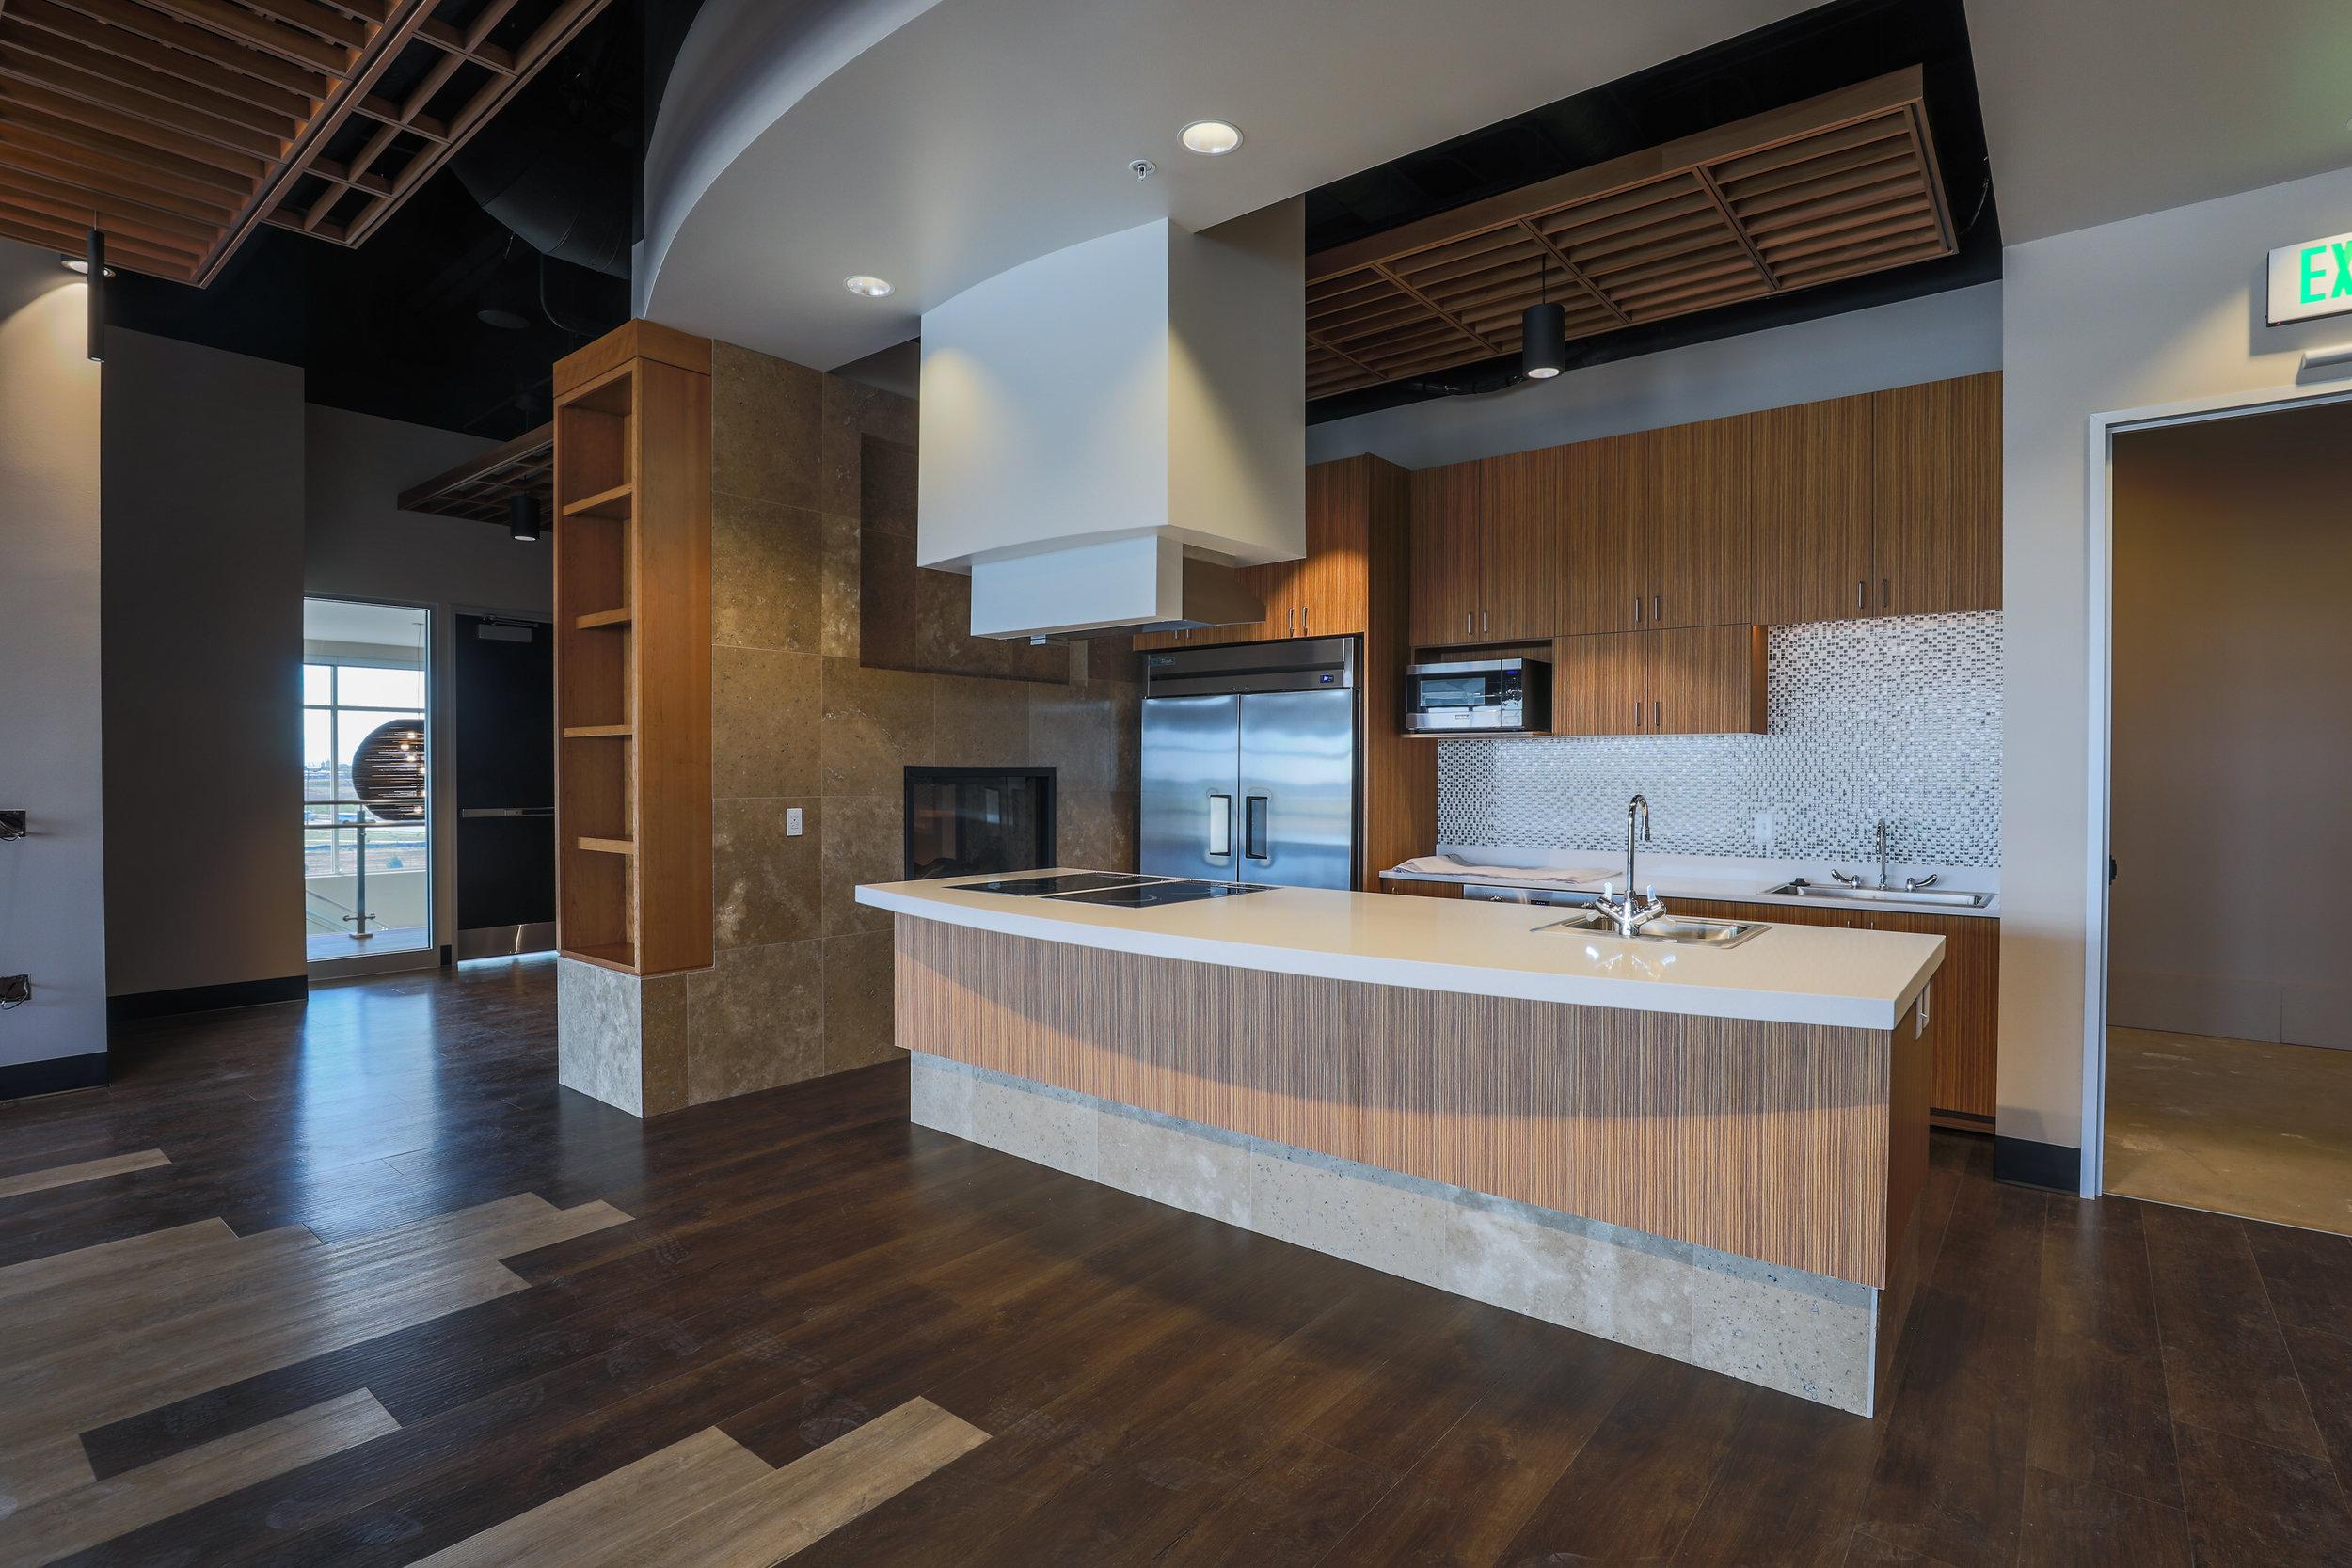 9410 E. 40th Avenue, Denver Beverage Distributors Office Interiors-72.jpg